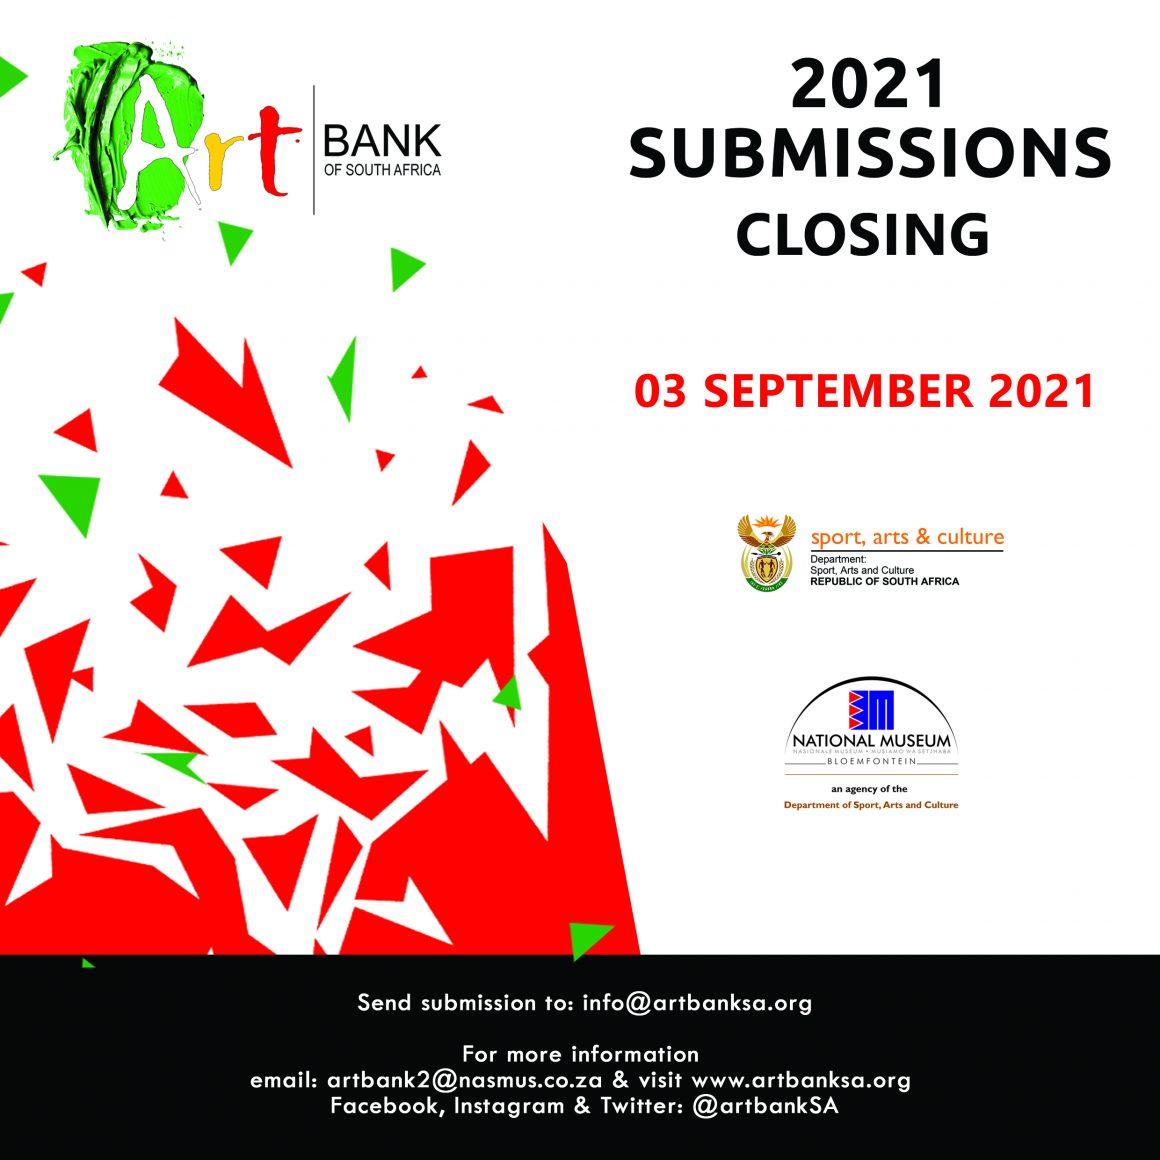 ArtbankSA Acquisitions: 2021 Submissions